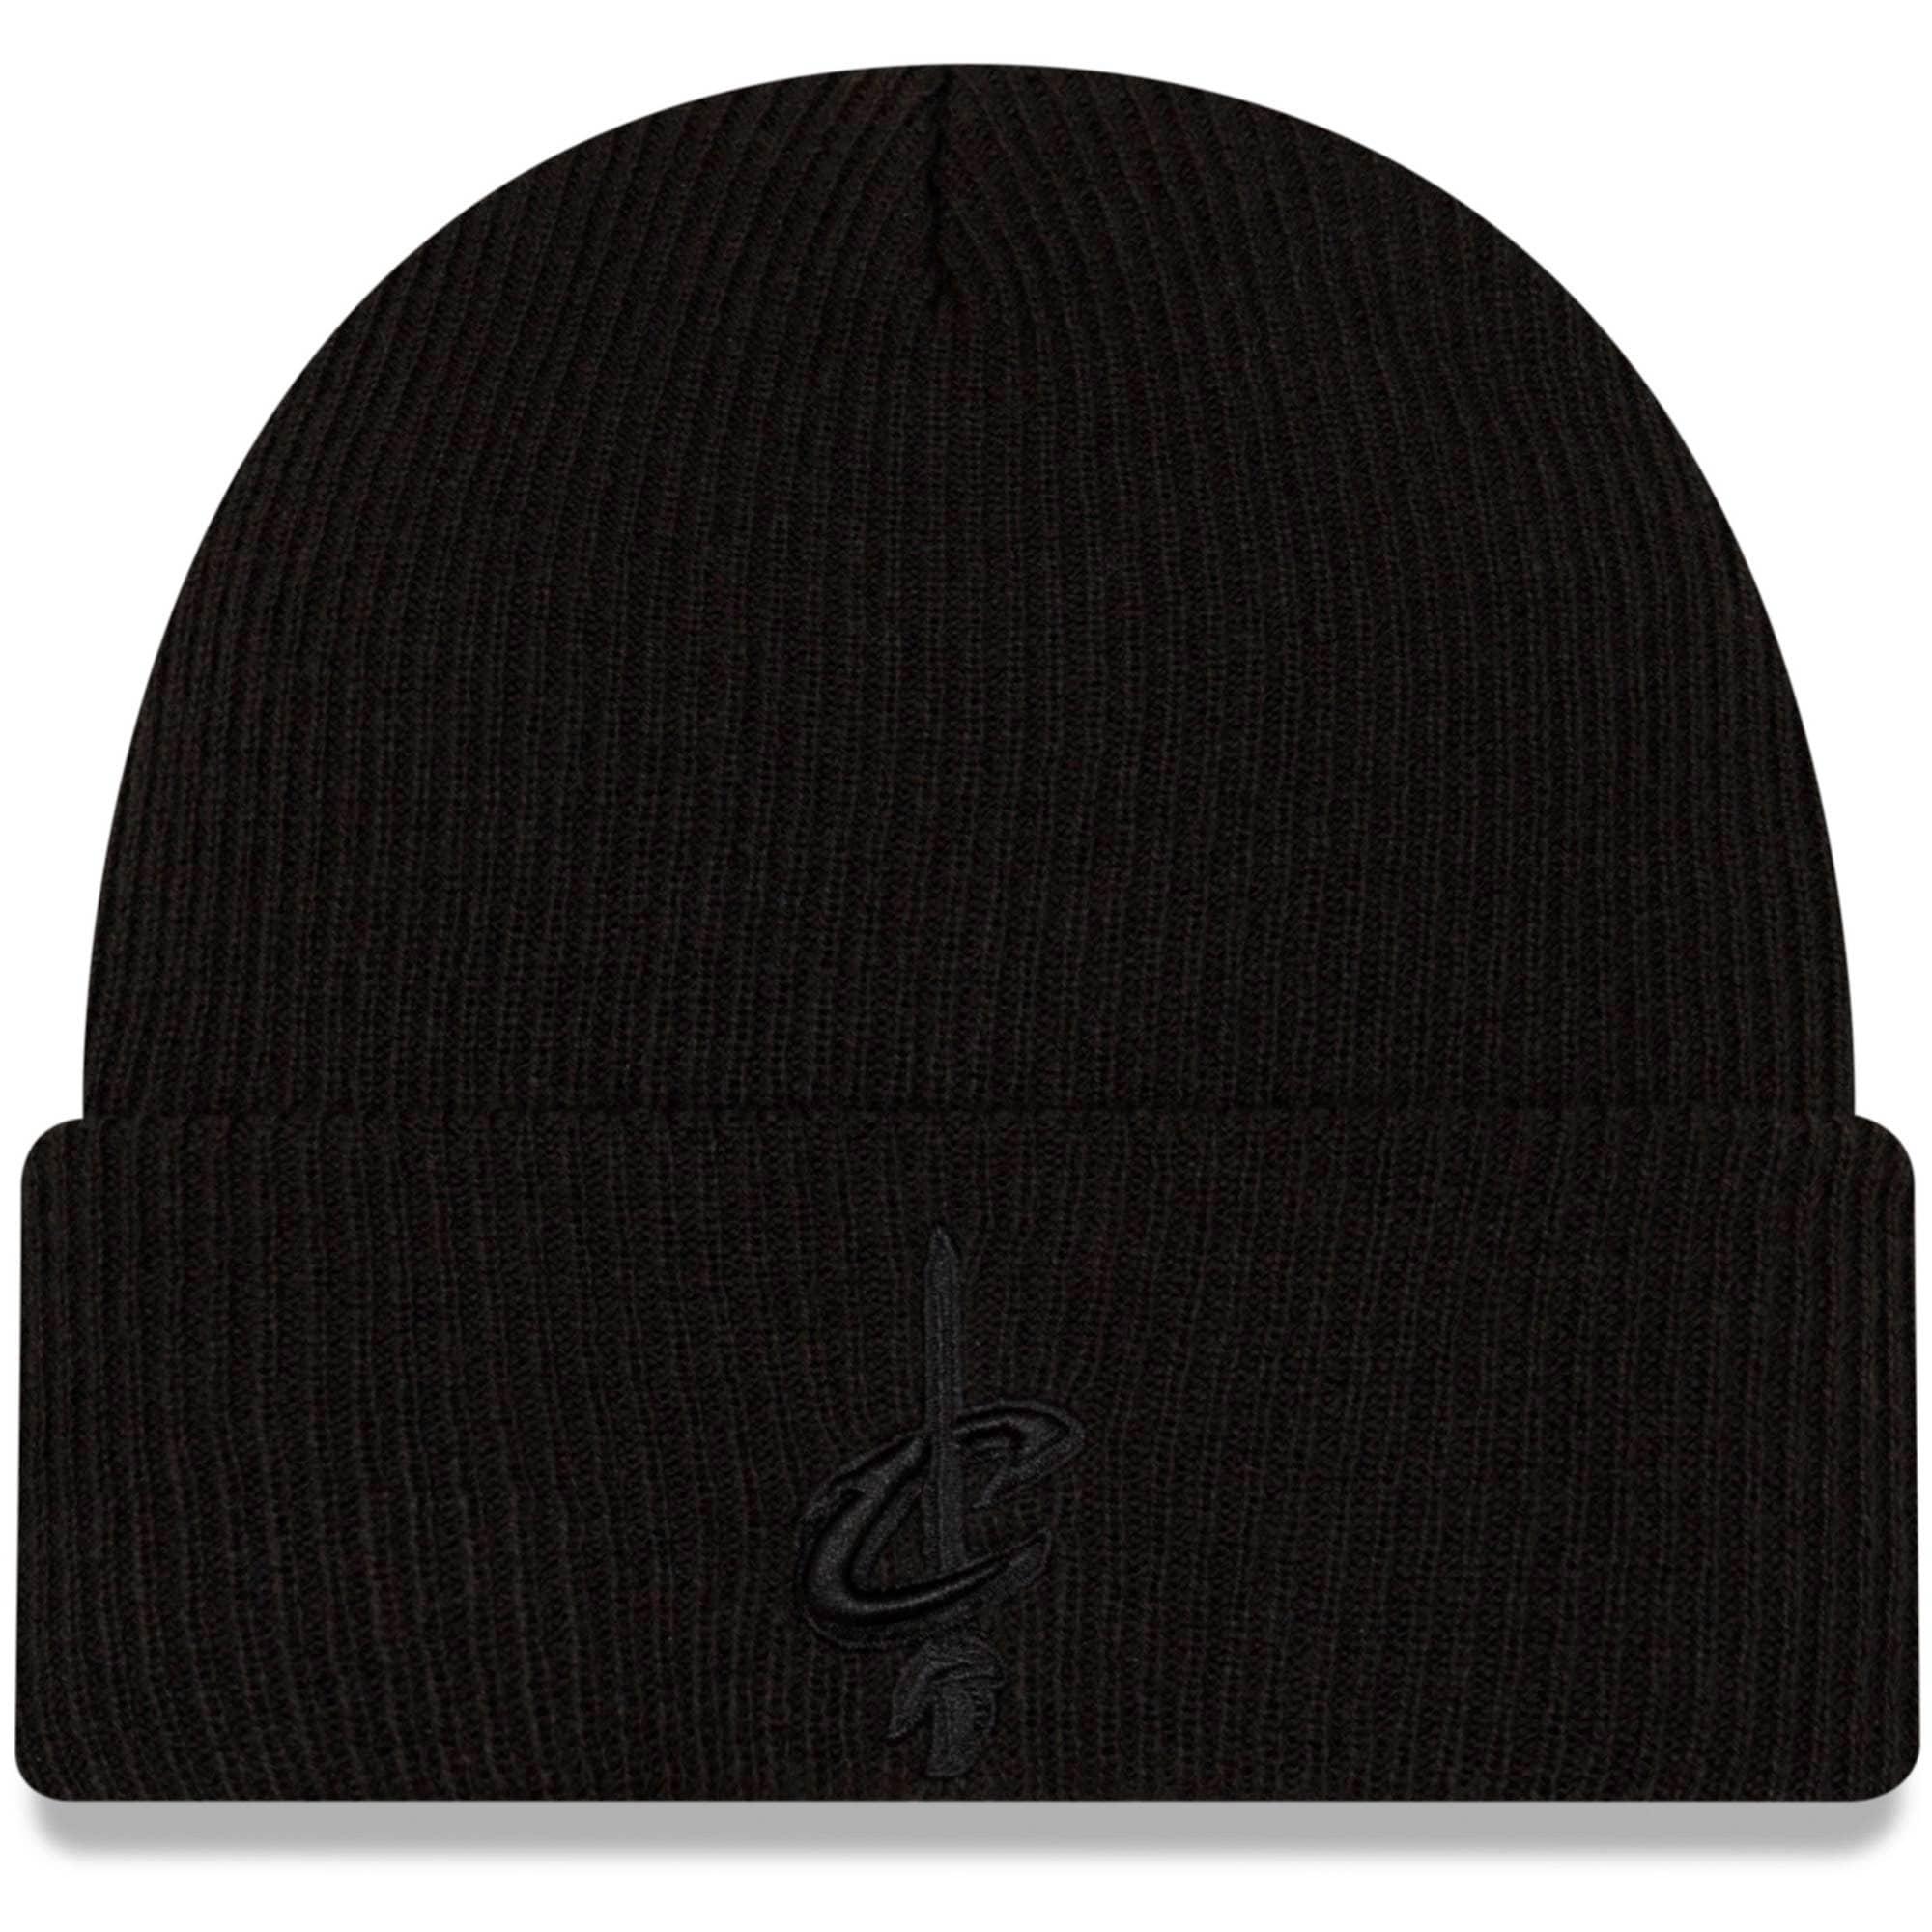 Cleveland Cavaliers New Era Blackout Cuffed Knit Hat - Black